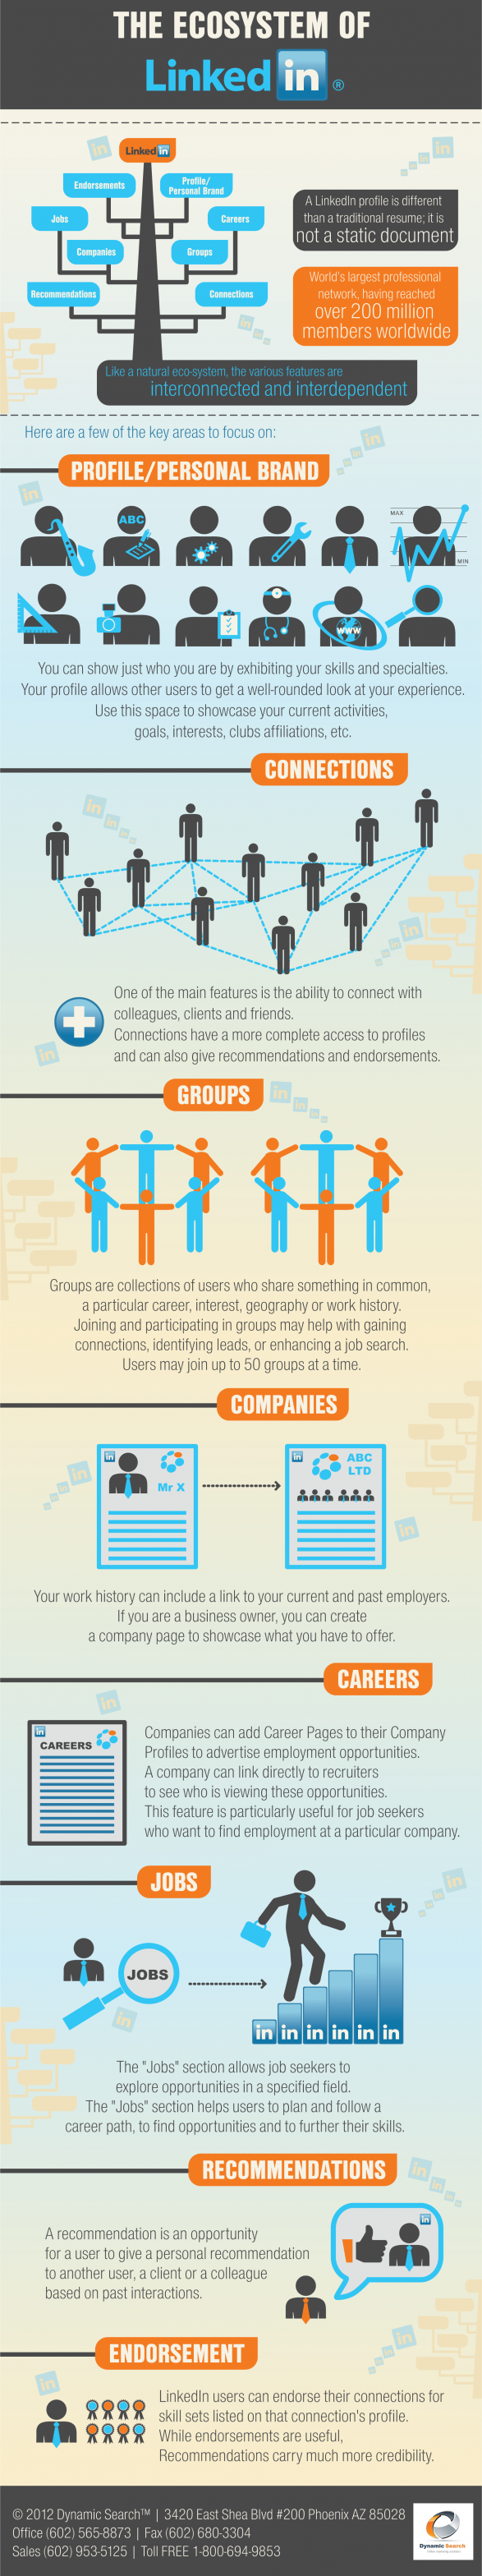 LinkedInEcosystem